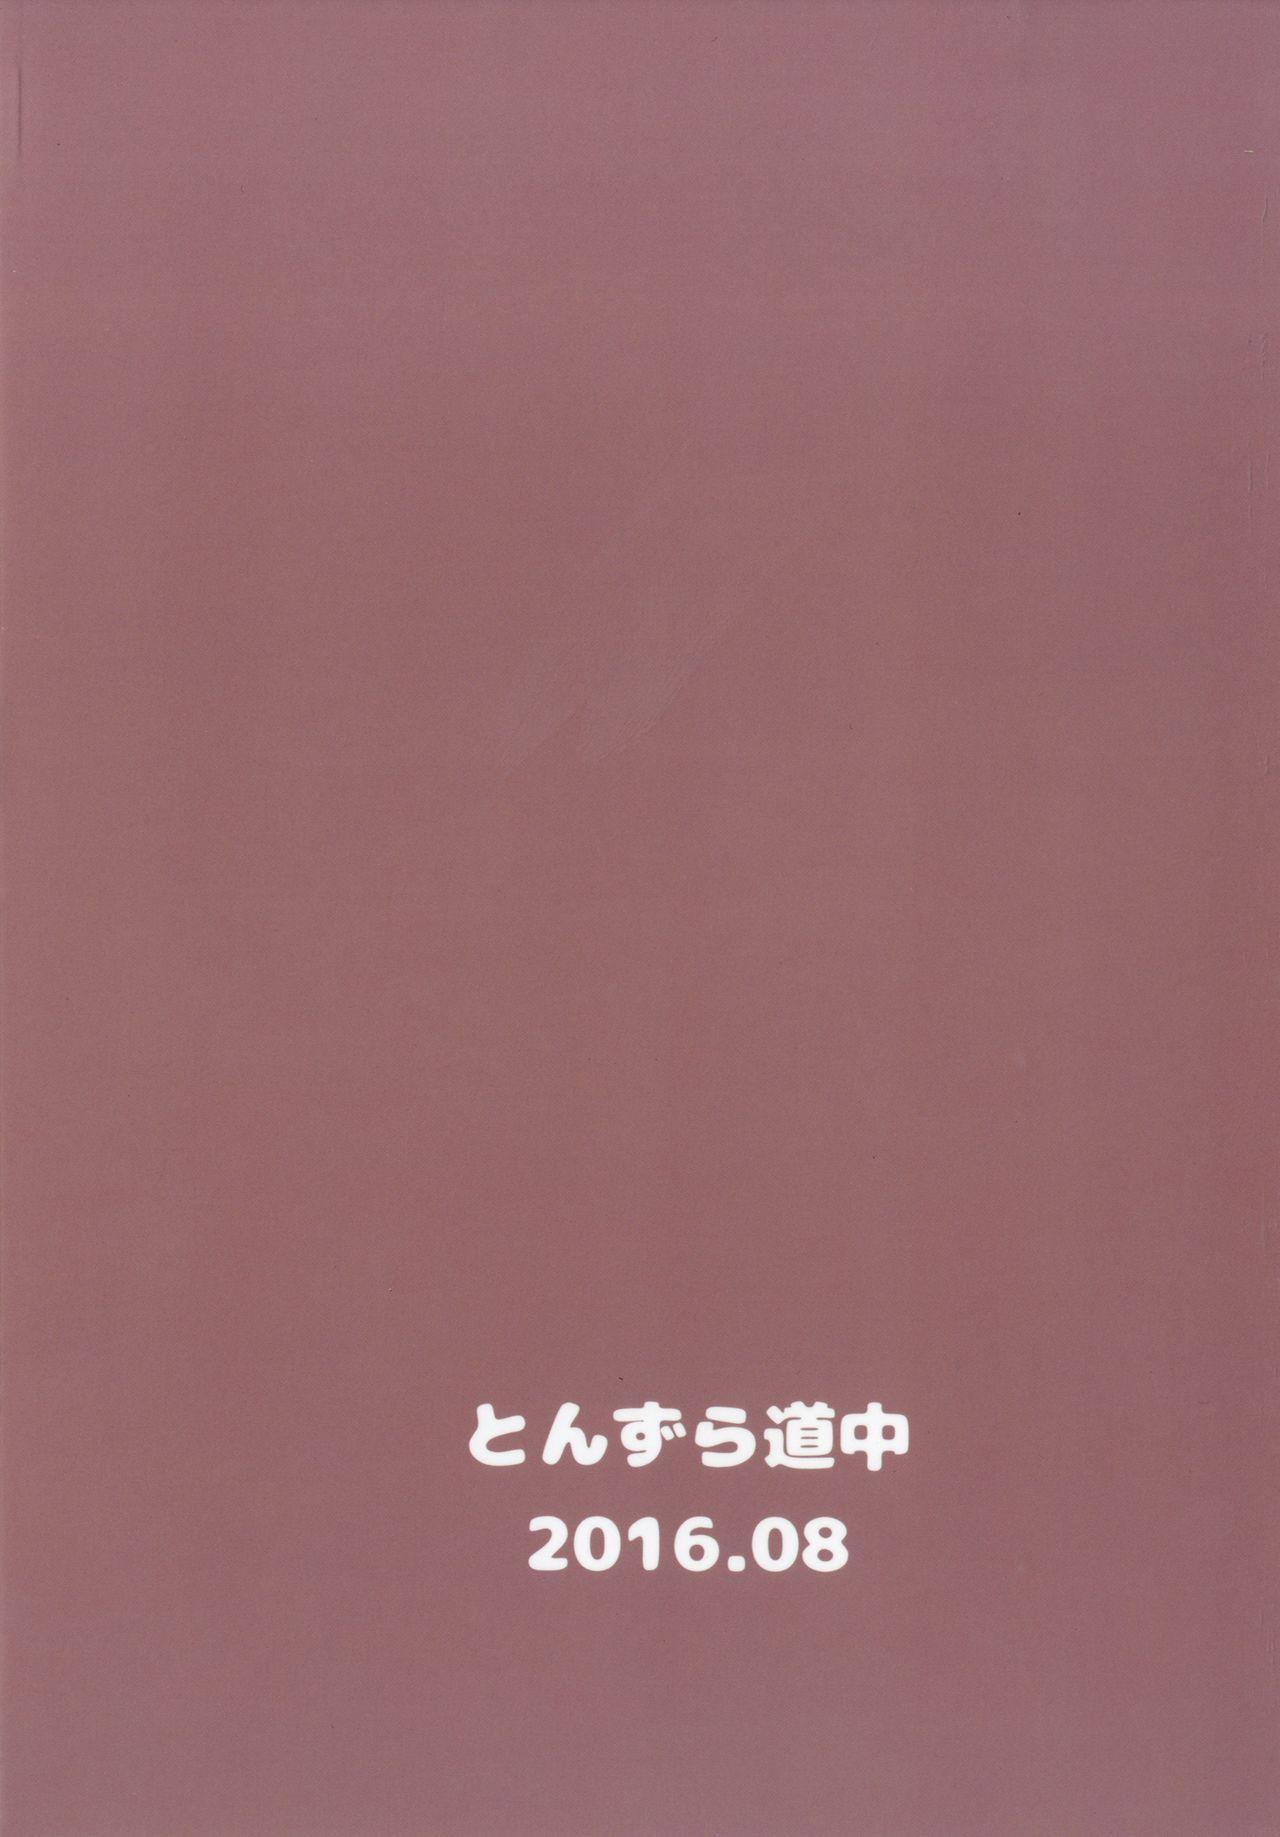 [Tonzura Douchuu (Kazawa)] Okaa-san Maryoku Kyoukyuu-tte?   Mom, What's a Mana Transfer? (Fate/Grand Order)  [English] [EHCOVE] [Digital] 21